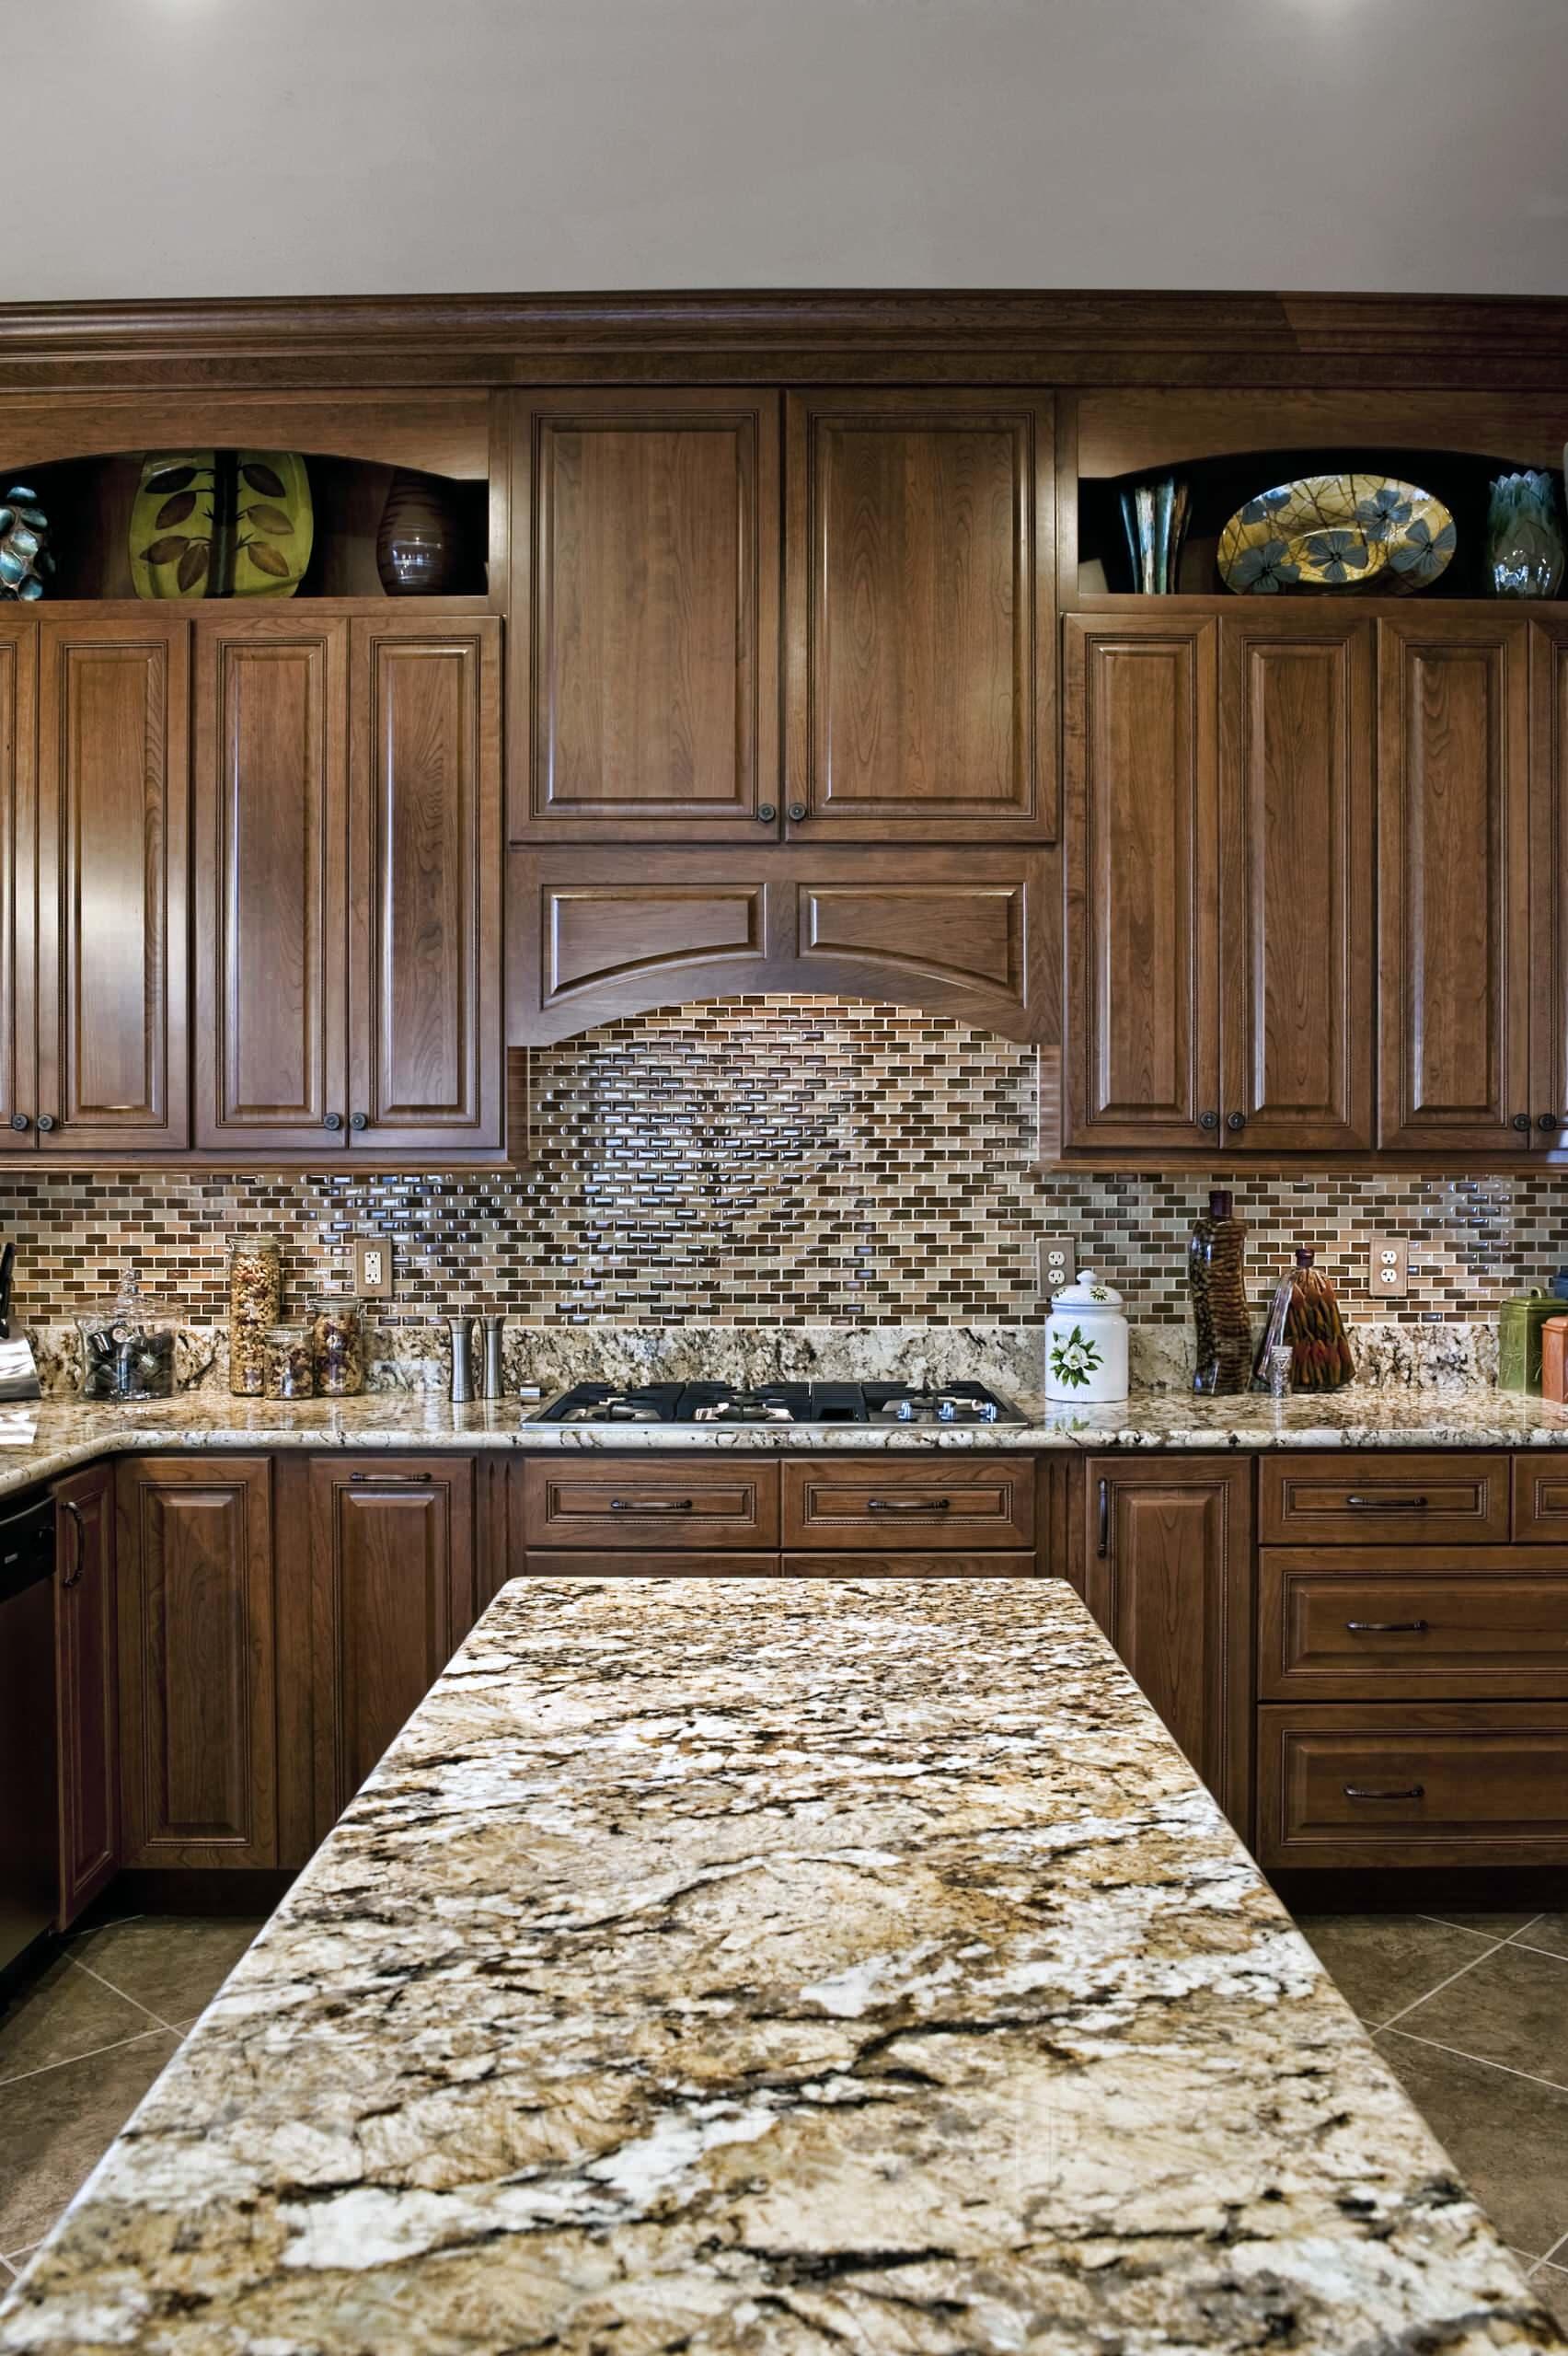 Floor Granite Tile Kitchen Ideas & Photos   Houzz